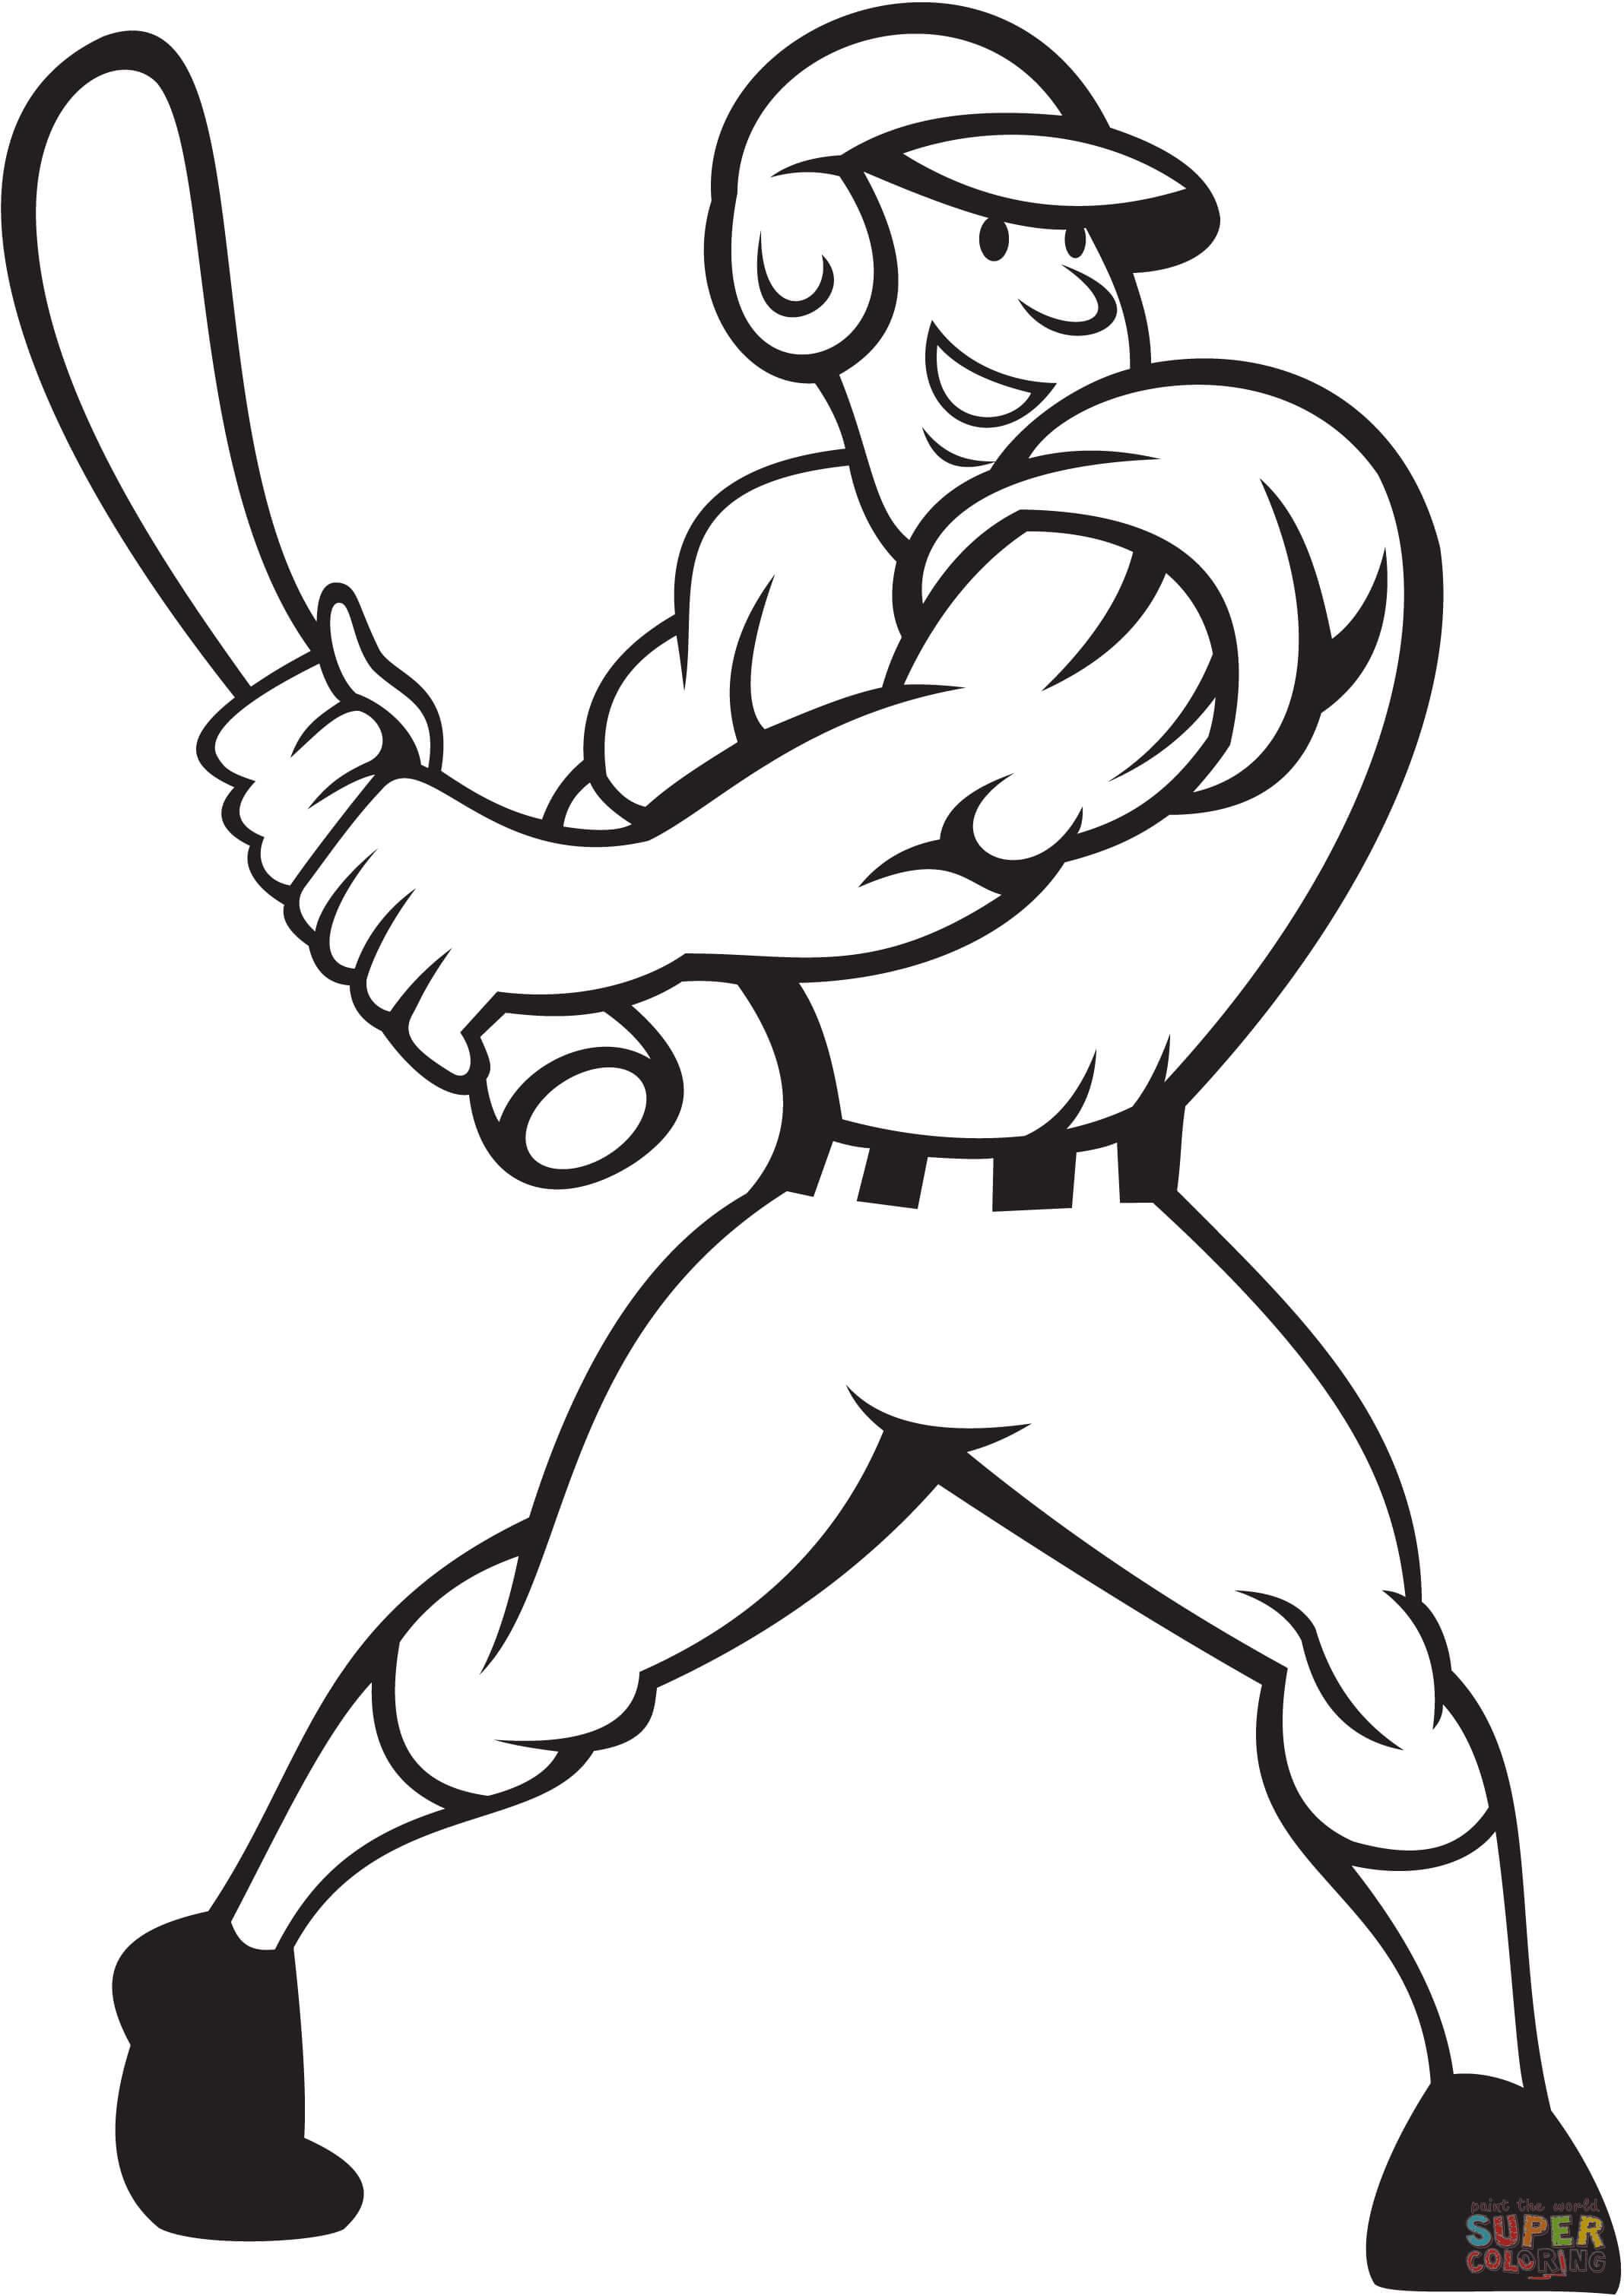 2136x3020 Baseball Player Batting Side Coloring Page Free Printable